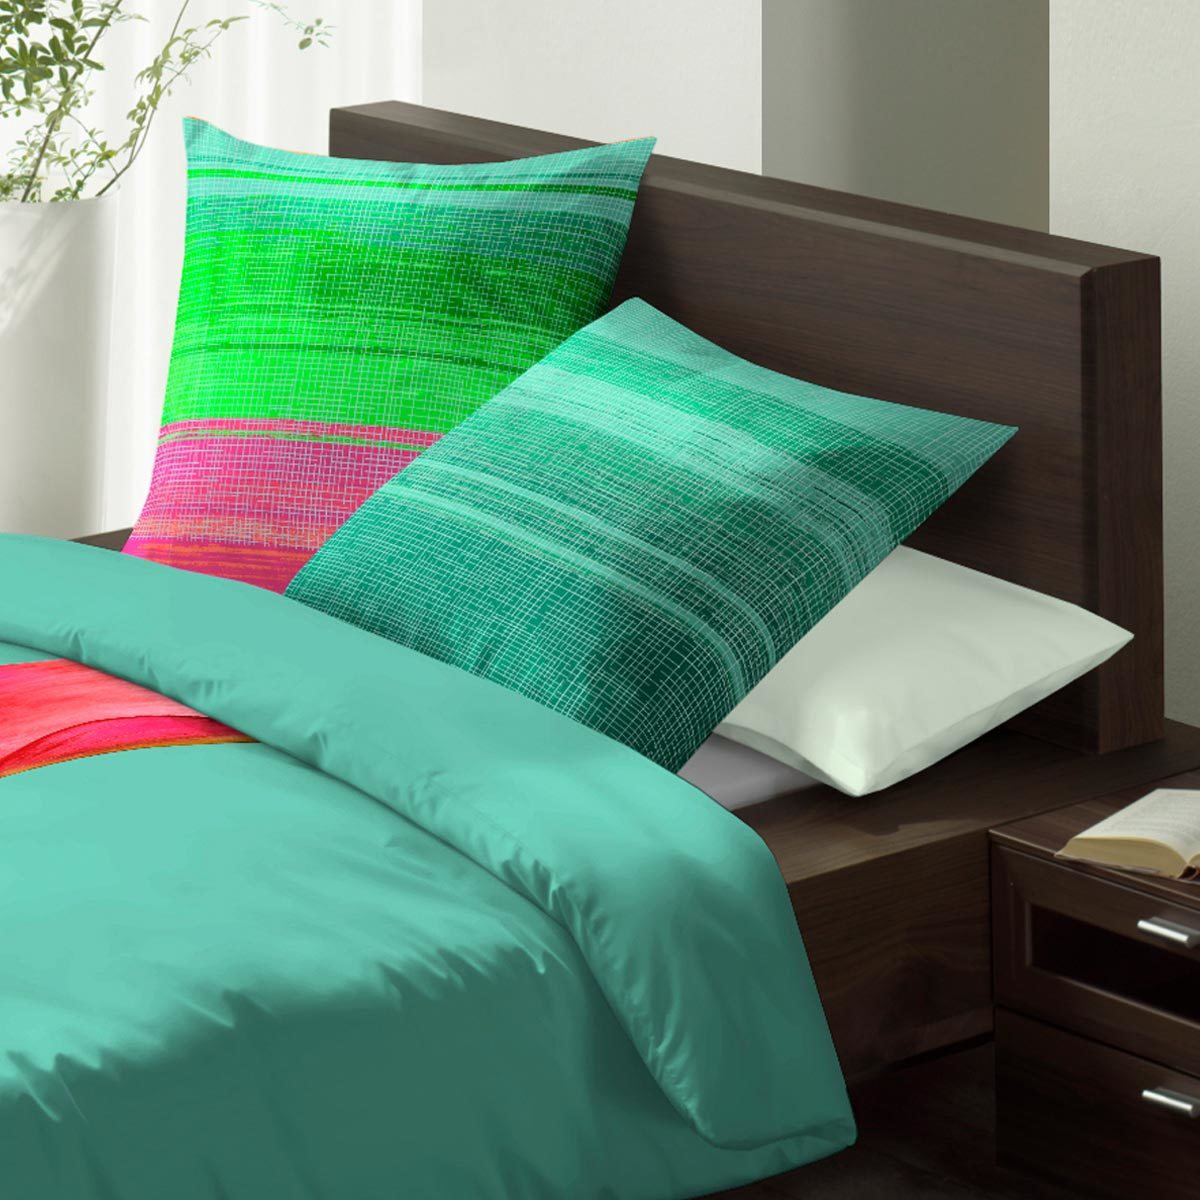 fleuresse mako satin bettw sche milano 113567 g nstig online kaufen bei bettwaren shop. Black Bedroom Furniture Sets. Home Design Ideas